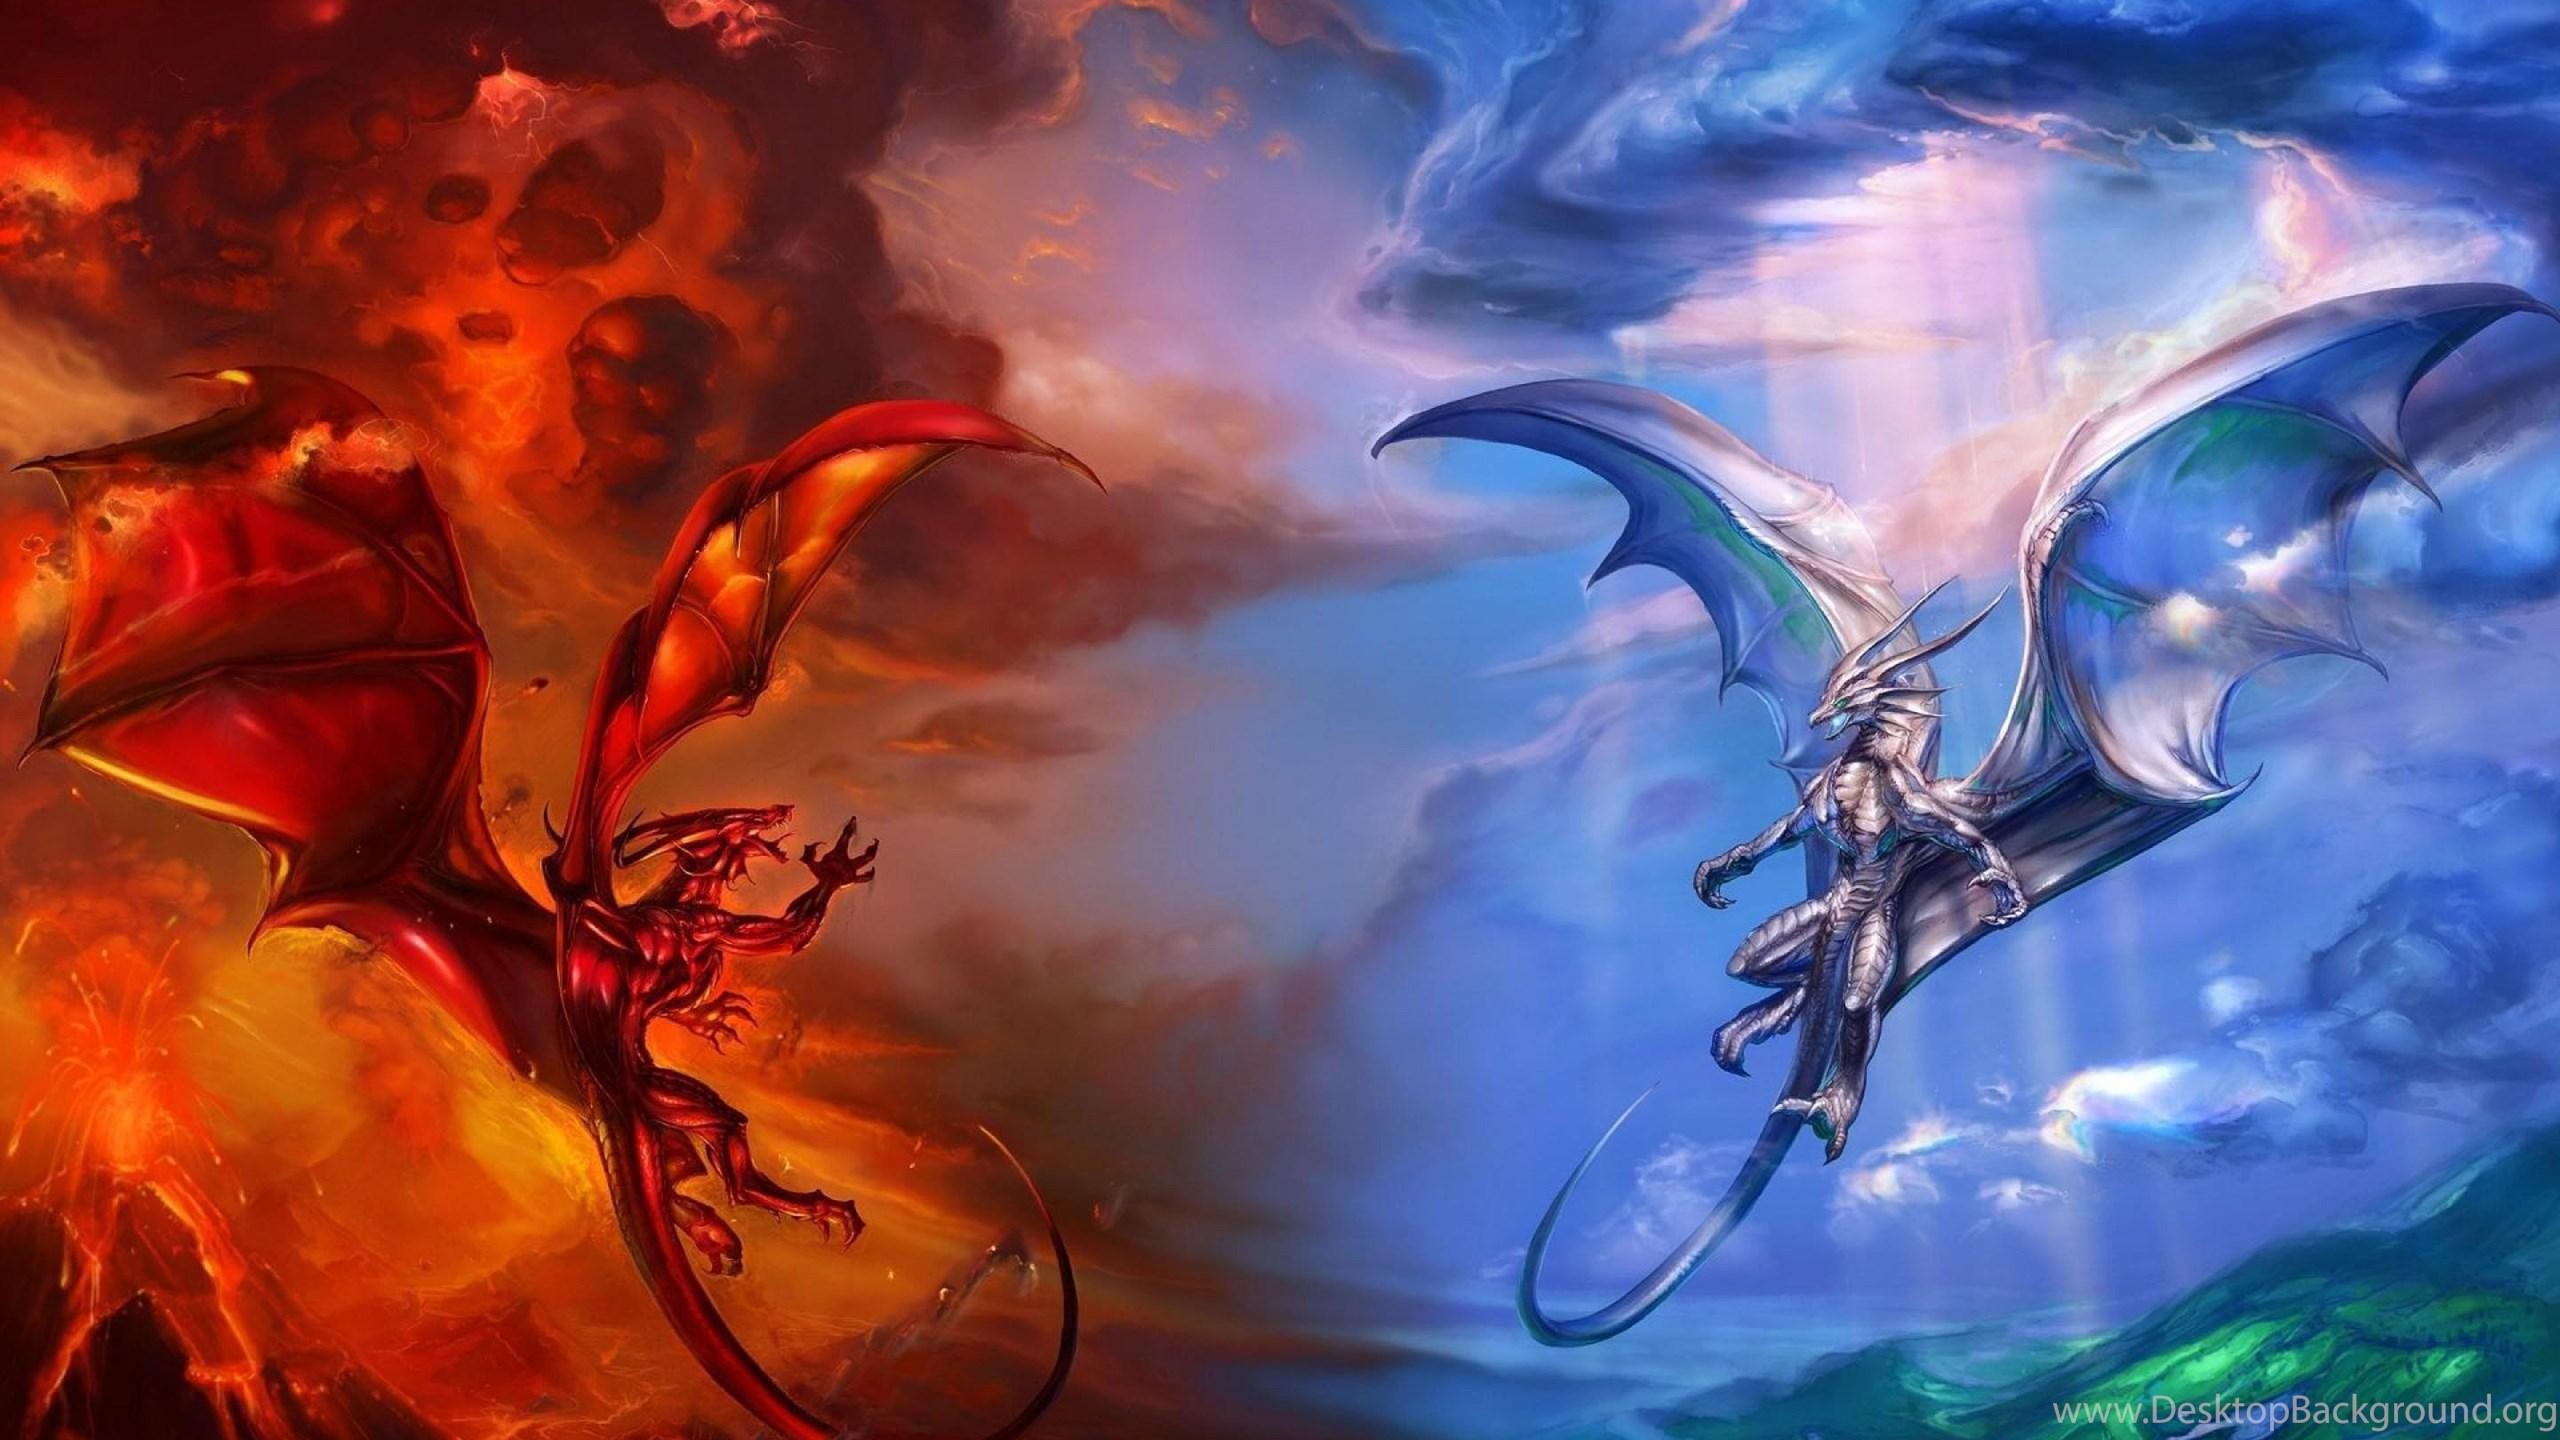 fire vs ice dragon wallpaper,fire hd wallpaper,dragon hd wallpapers